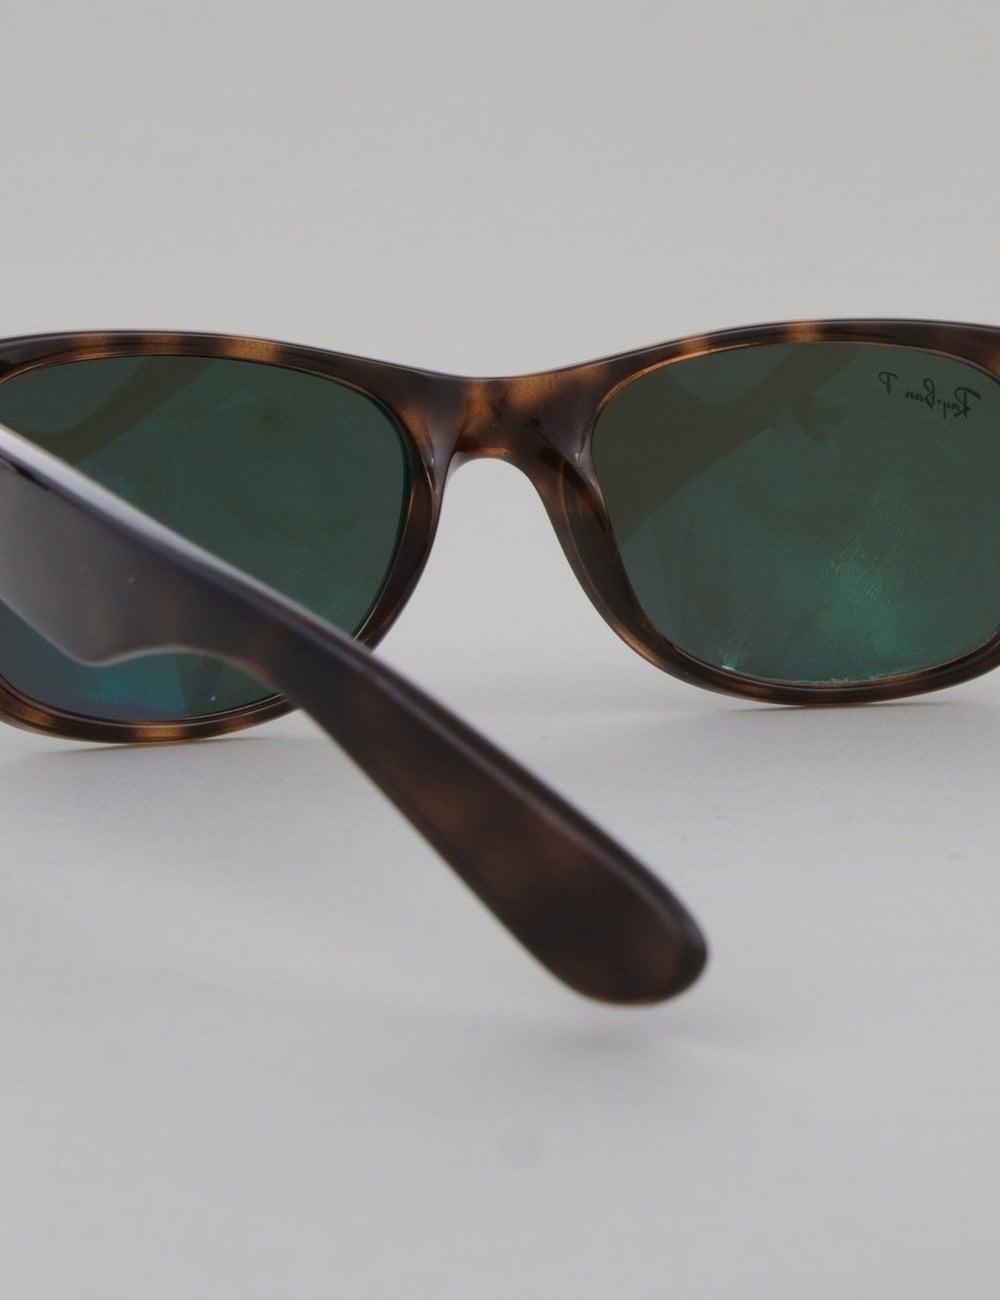 eae876a2ed Ray-Ban New Wayfarer Sunglasses - Tortoise    Crystal Green ...